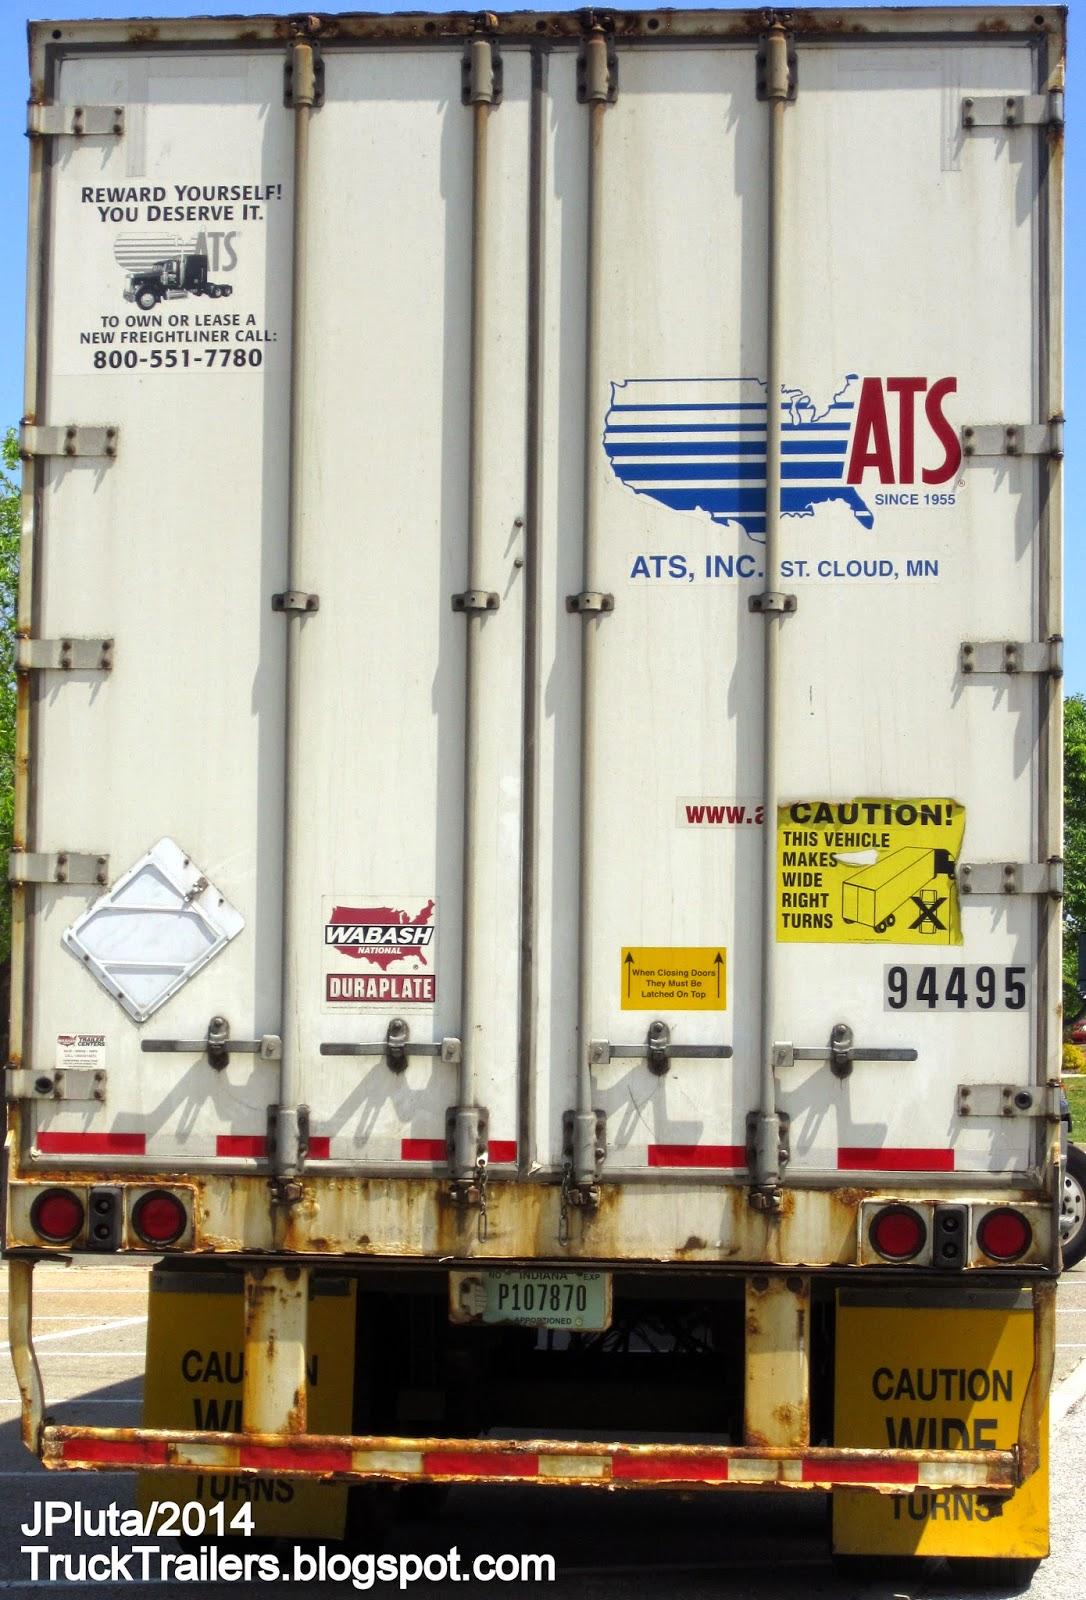 Ats inc anderson trucking company st cloud minnesota